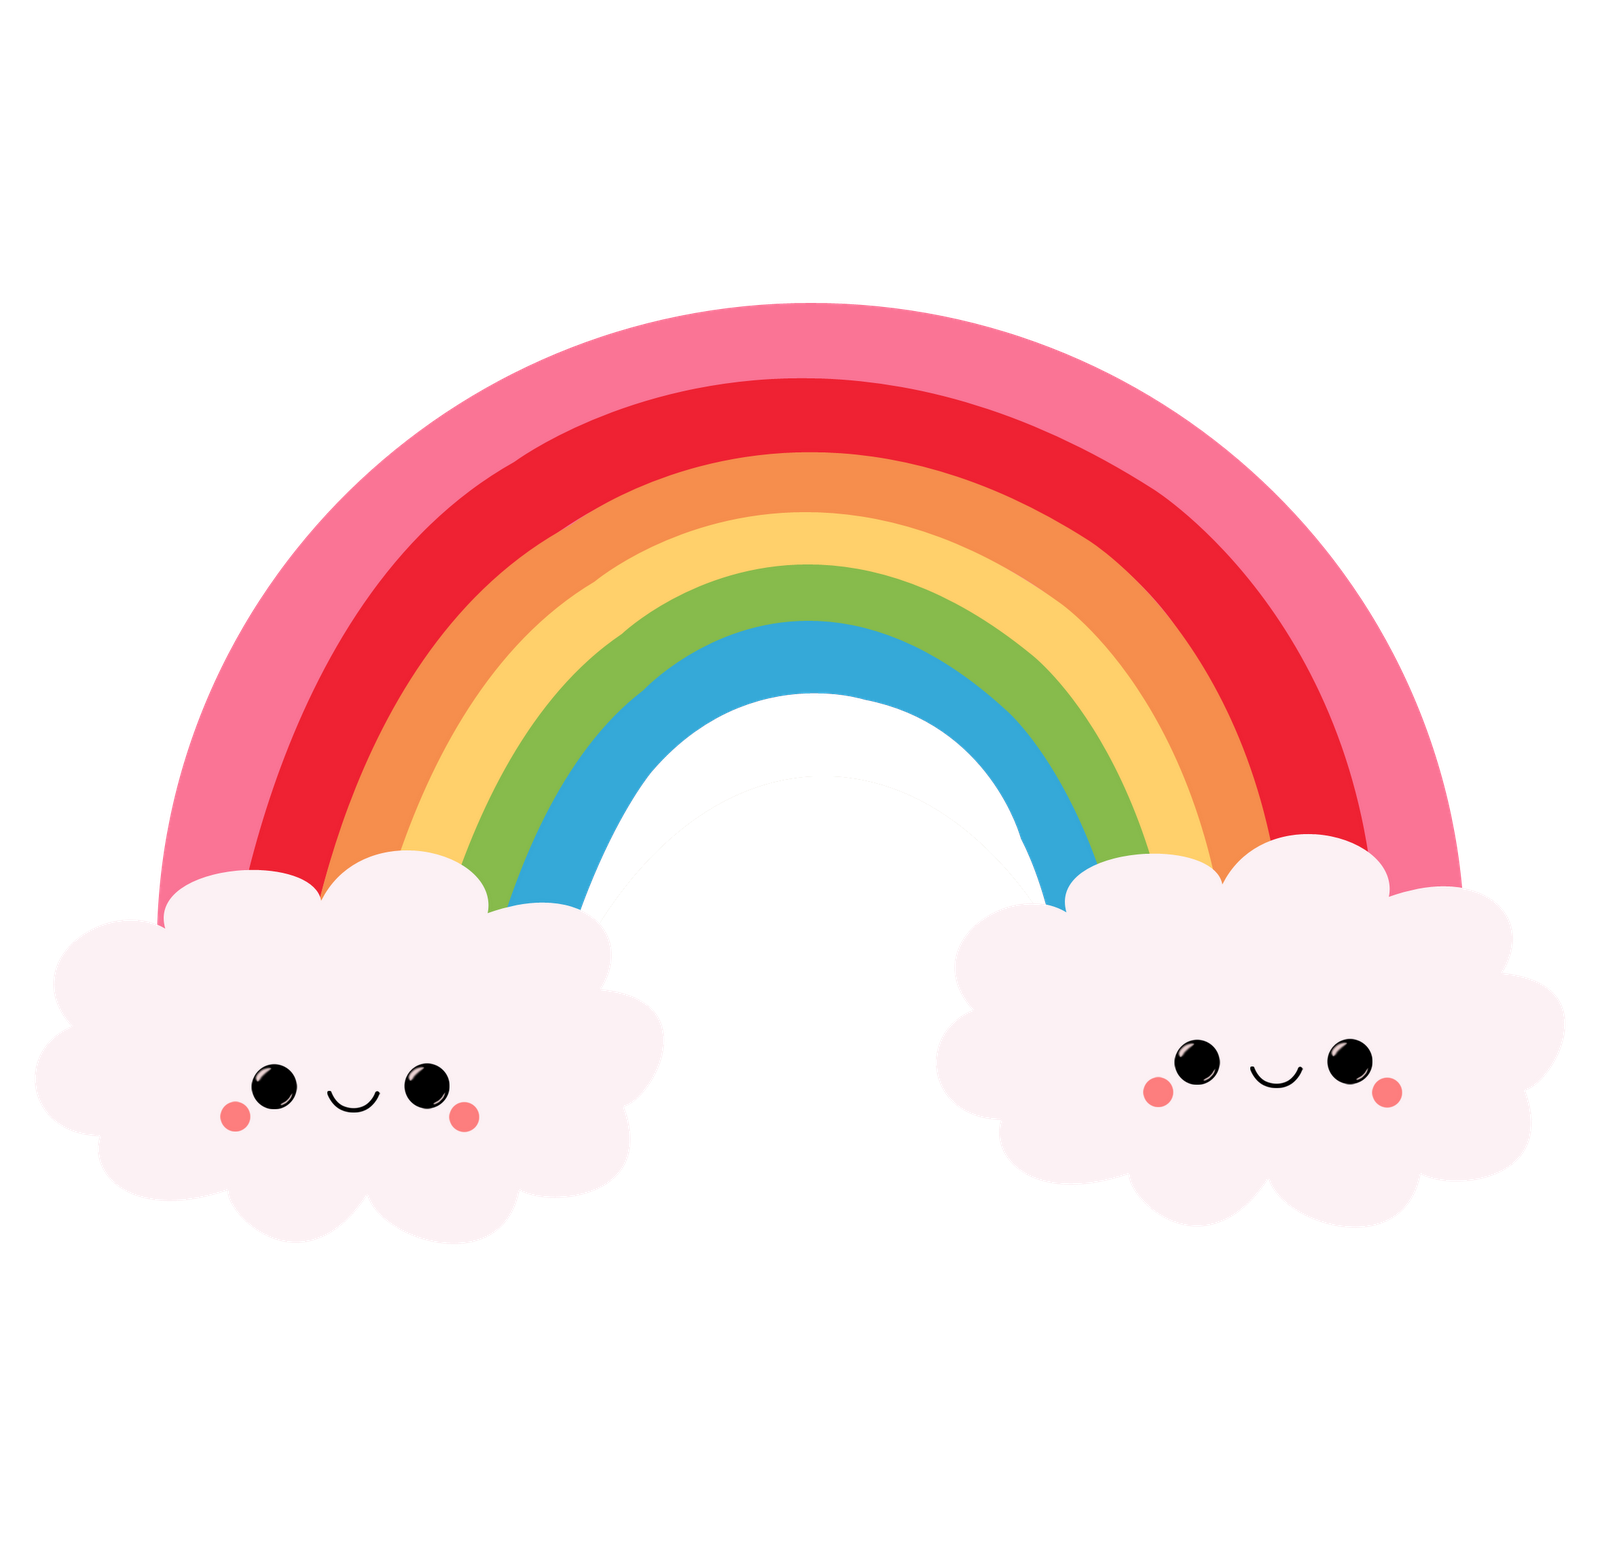 Sun peeking around clouds clipart image library arcoiris png - Buscar con Google | Clipart | Pinterest | Kawaii ... image library